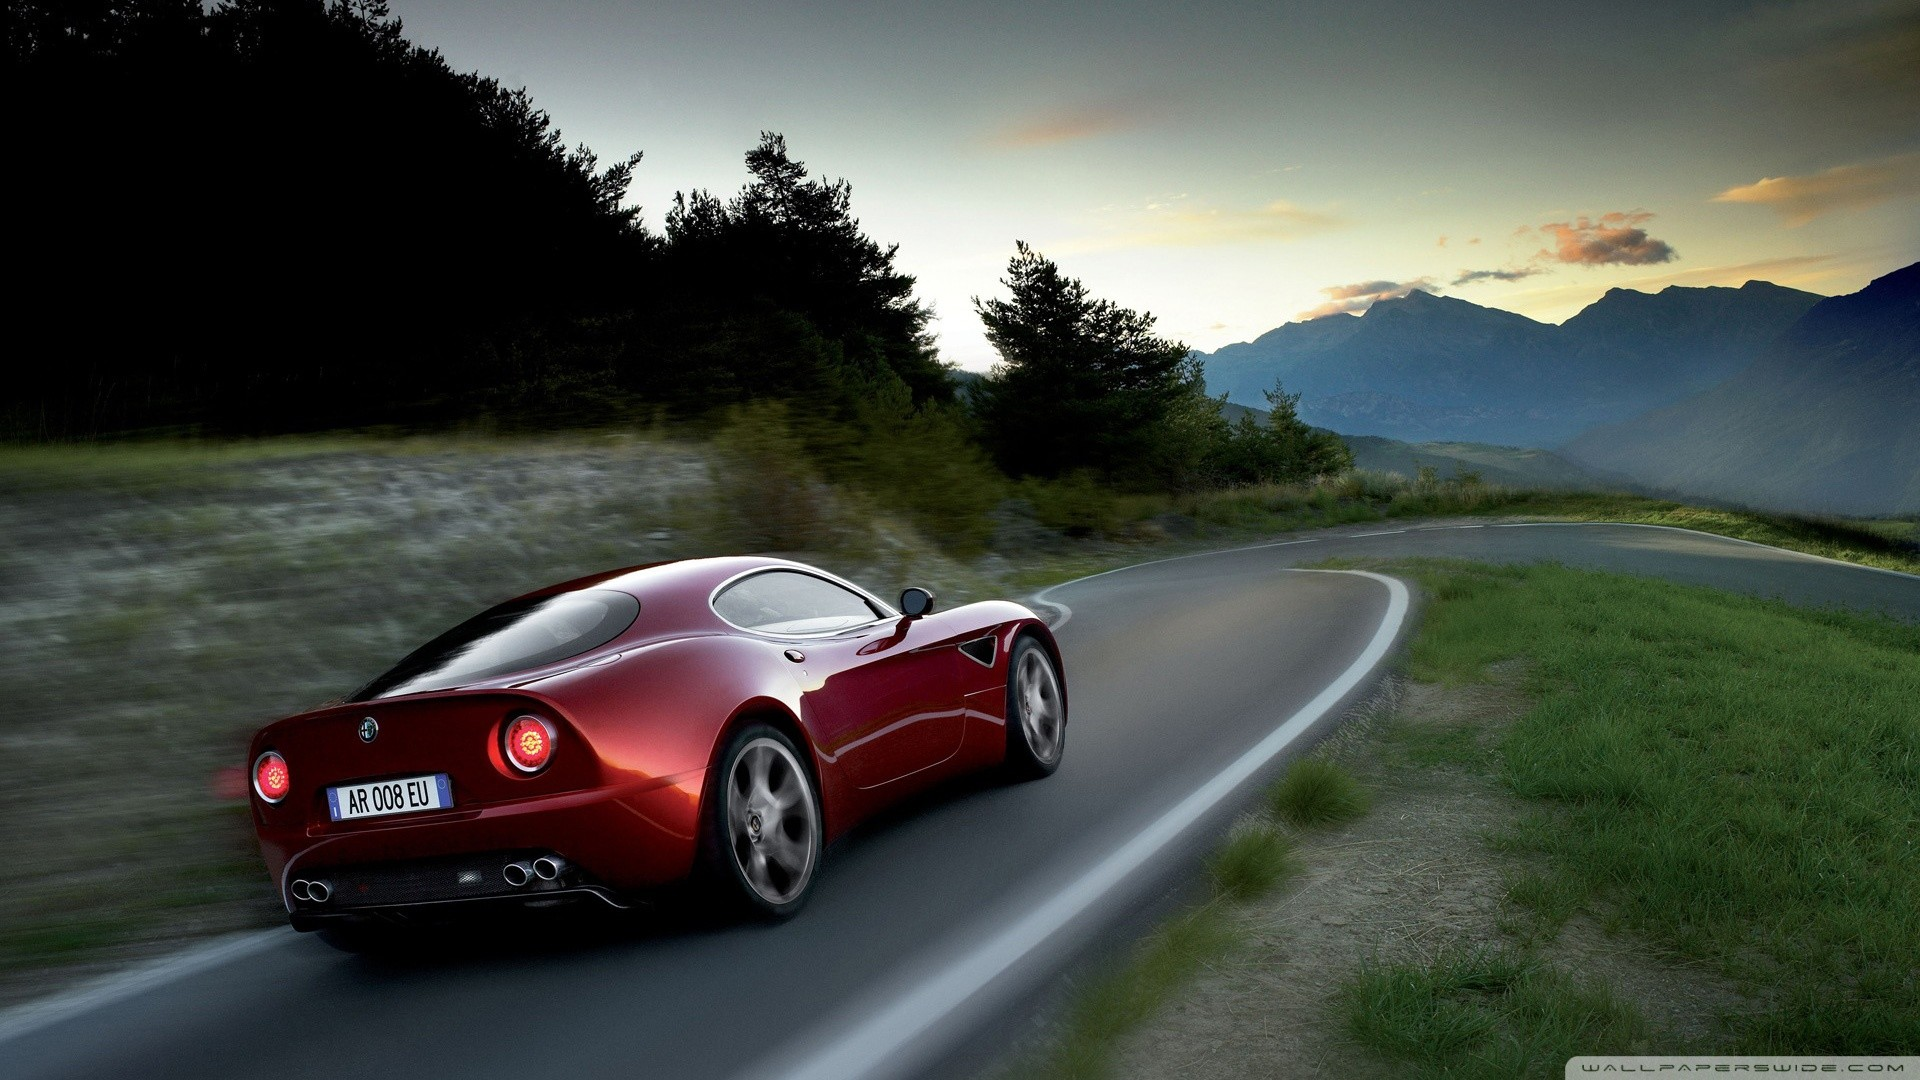 Standard Data Src W Full 7 E 0 348051 Alfa Romeo 8c 1920x1080 Wallpaper Teahub Io